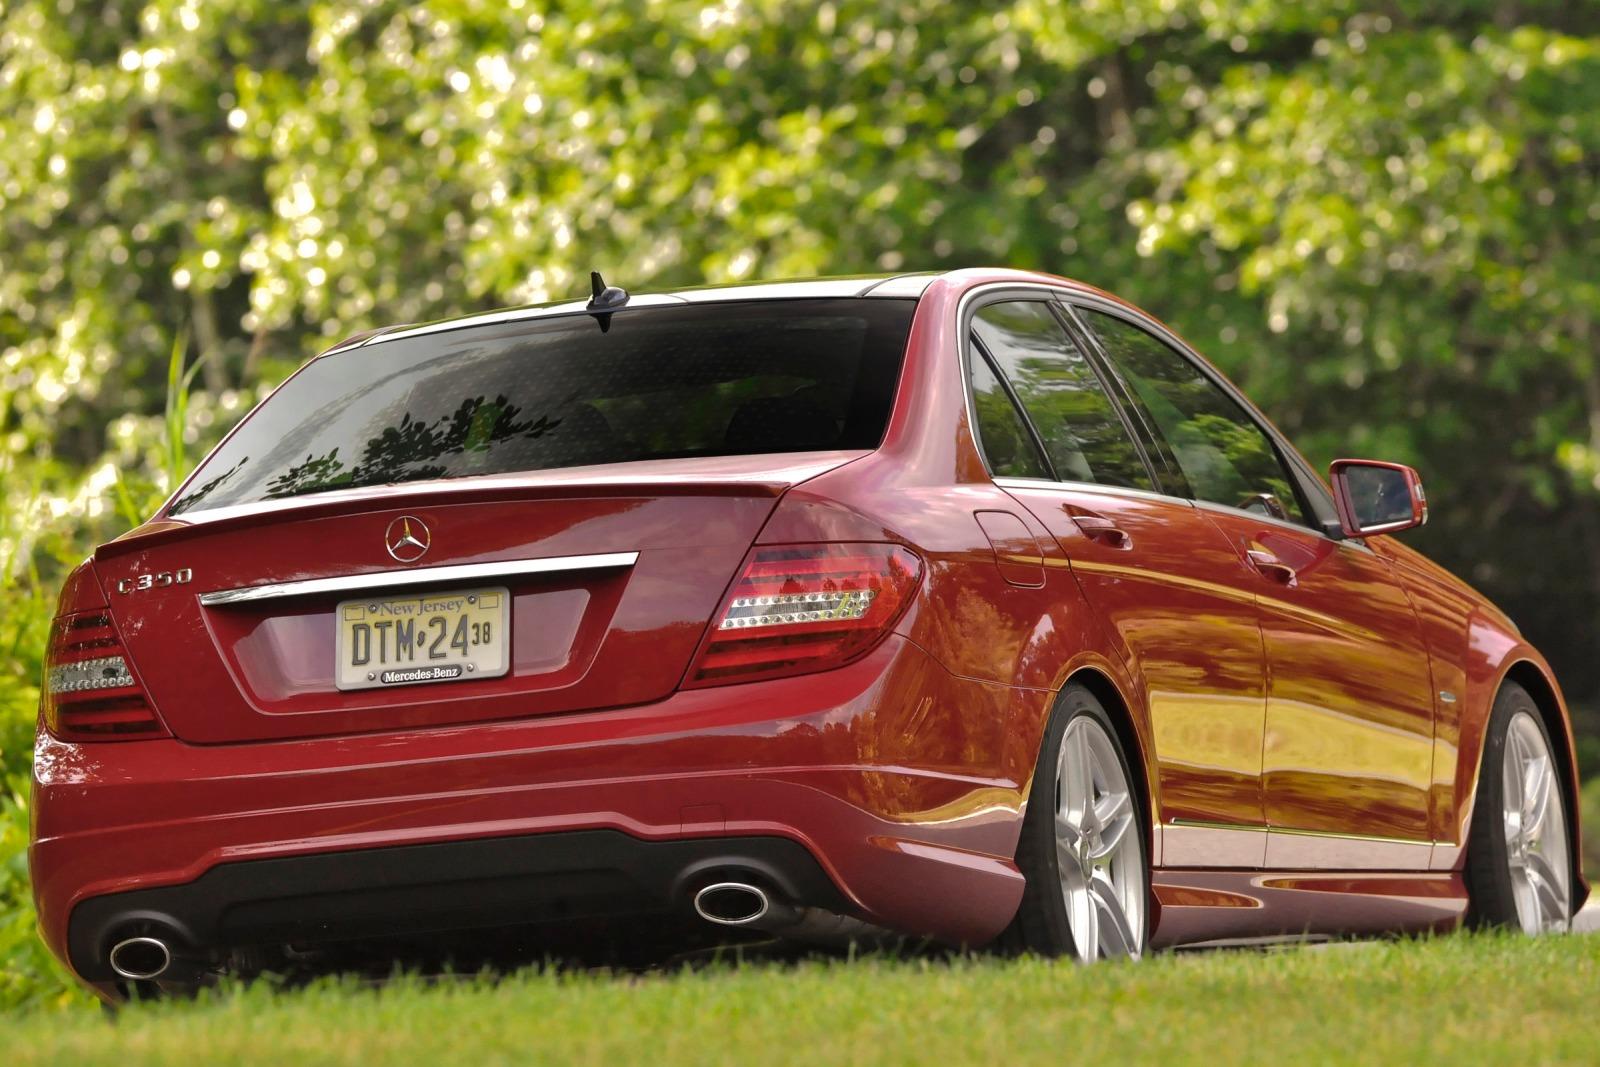 2012 Mercedes-Benz C-Class VIN Number Search - AutoDetective